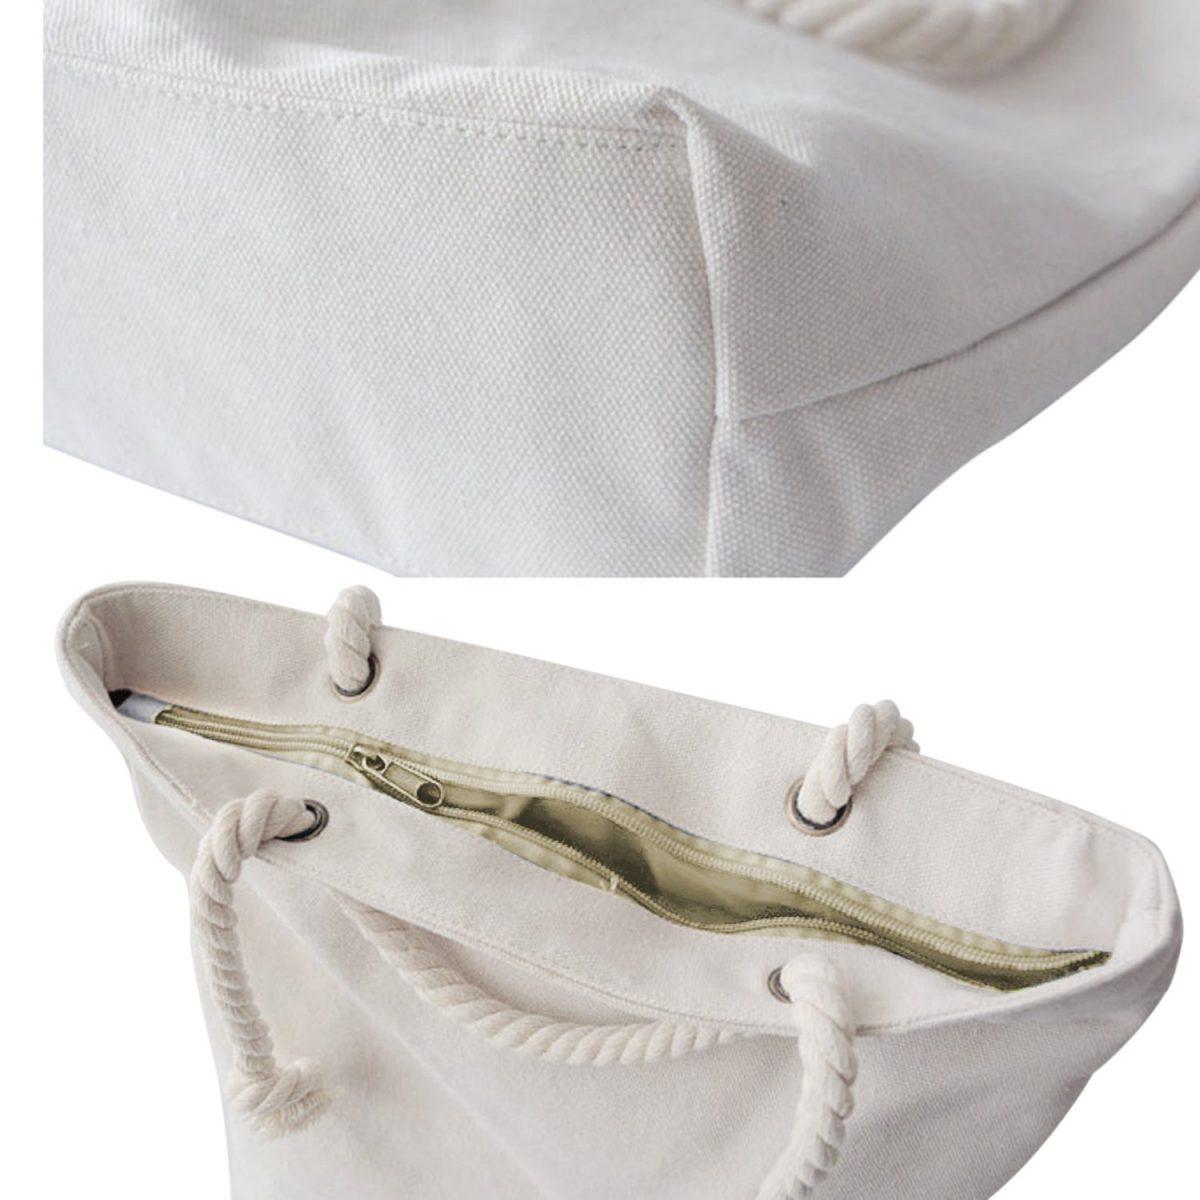 Beautiful Girl Tasarımlı Popart Fermuarlı Modern Kumaş Çanta Realhomes